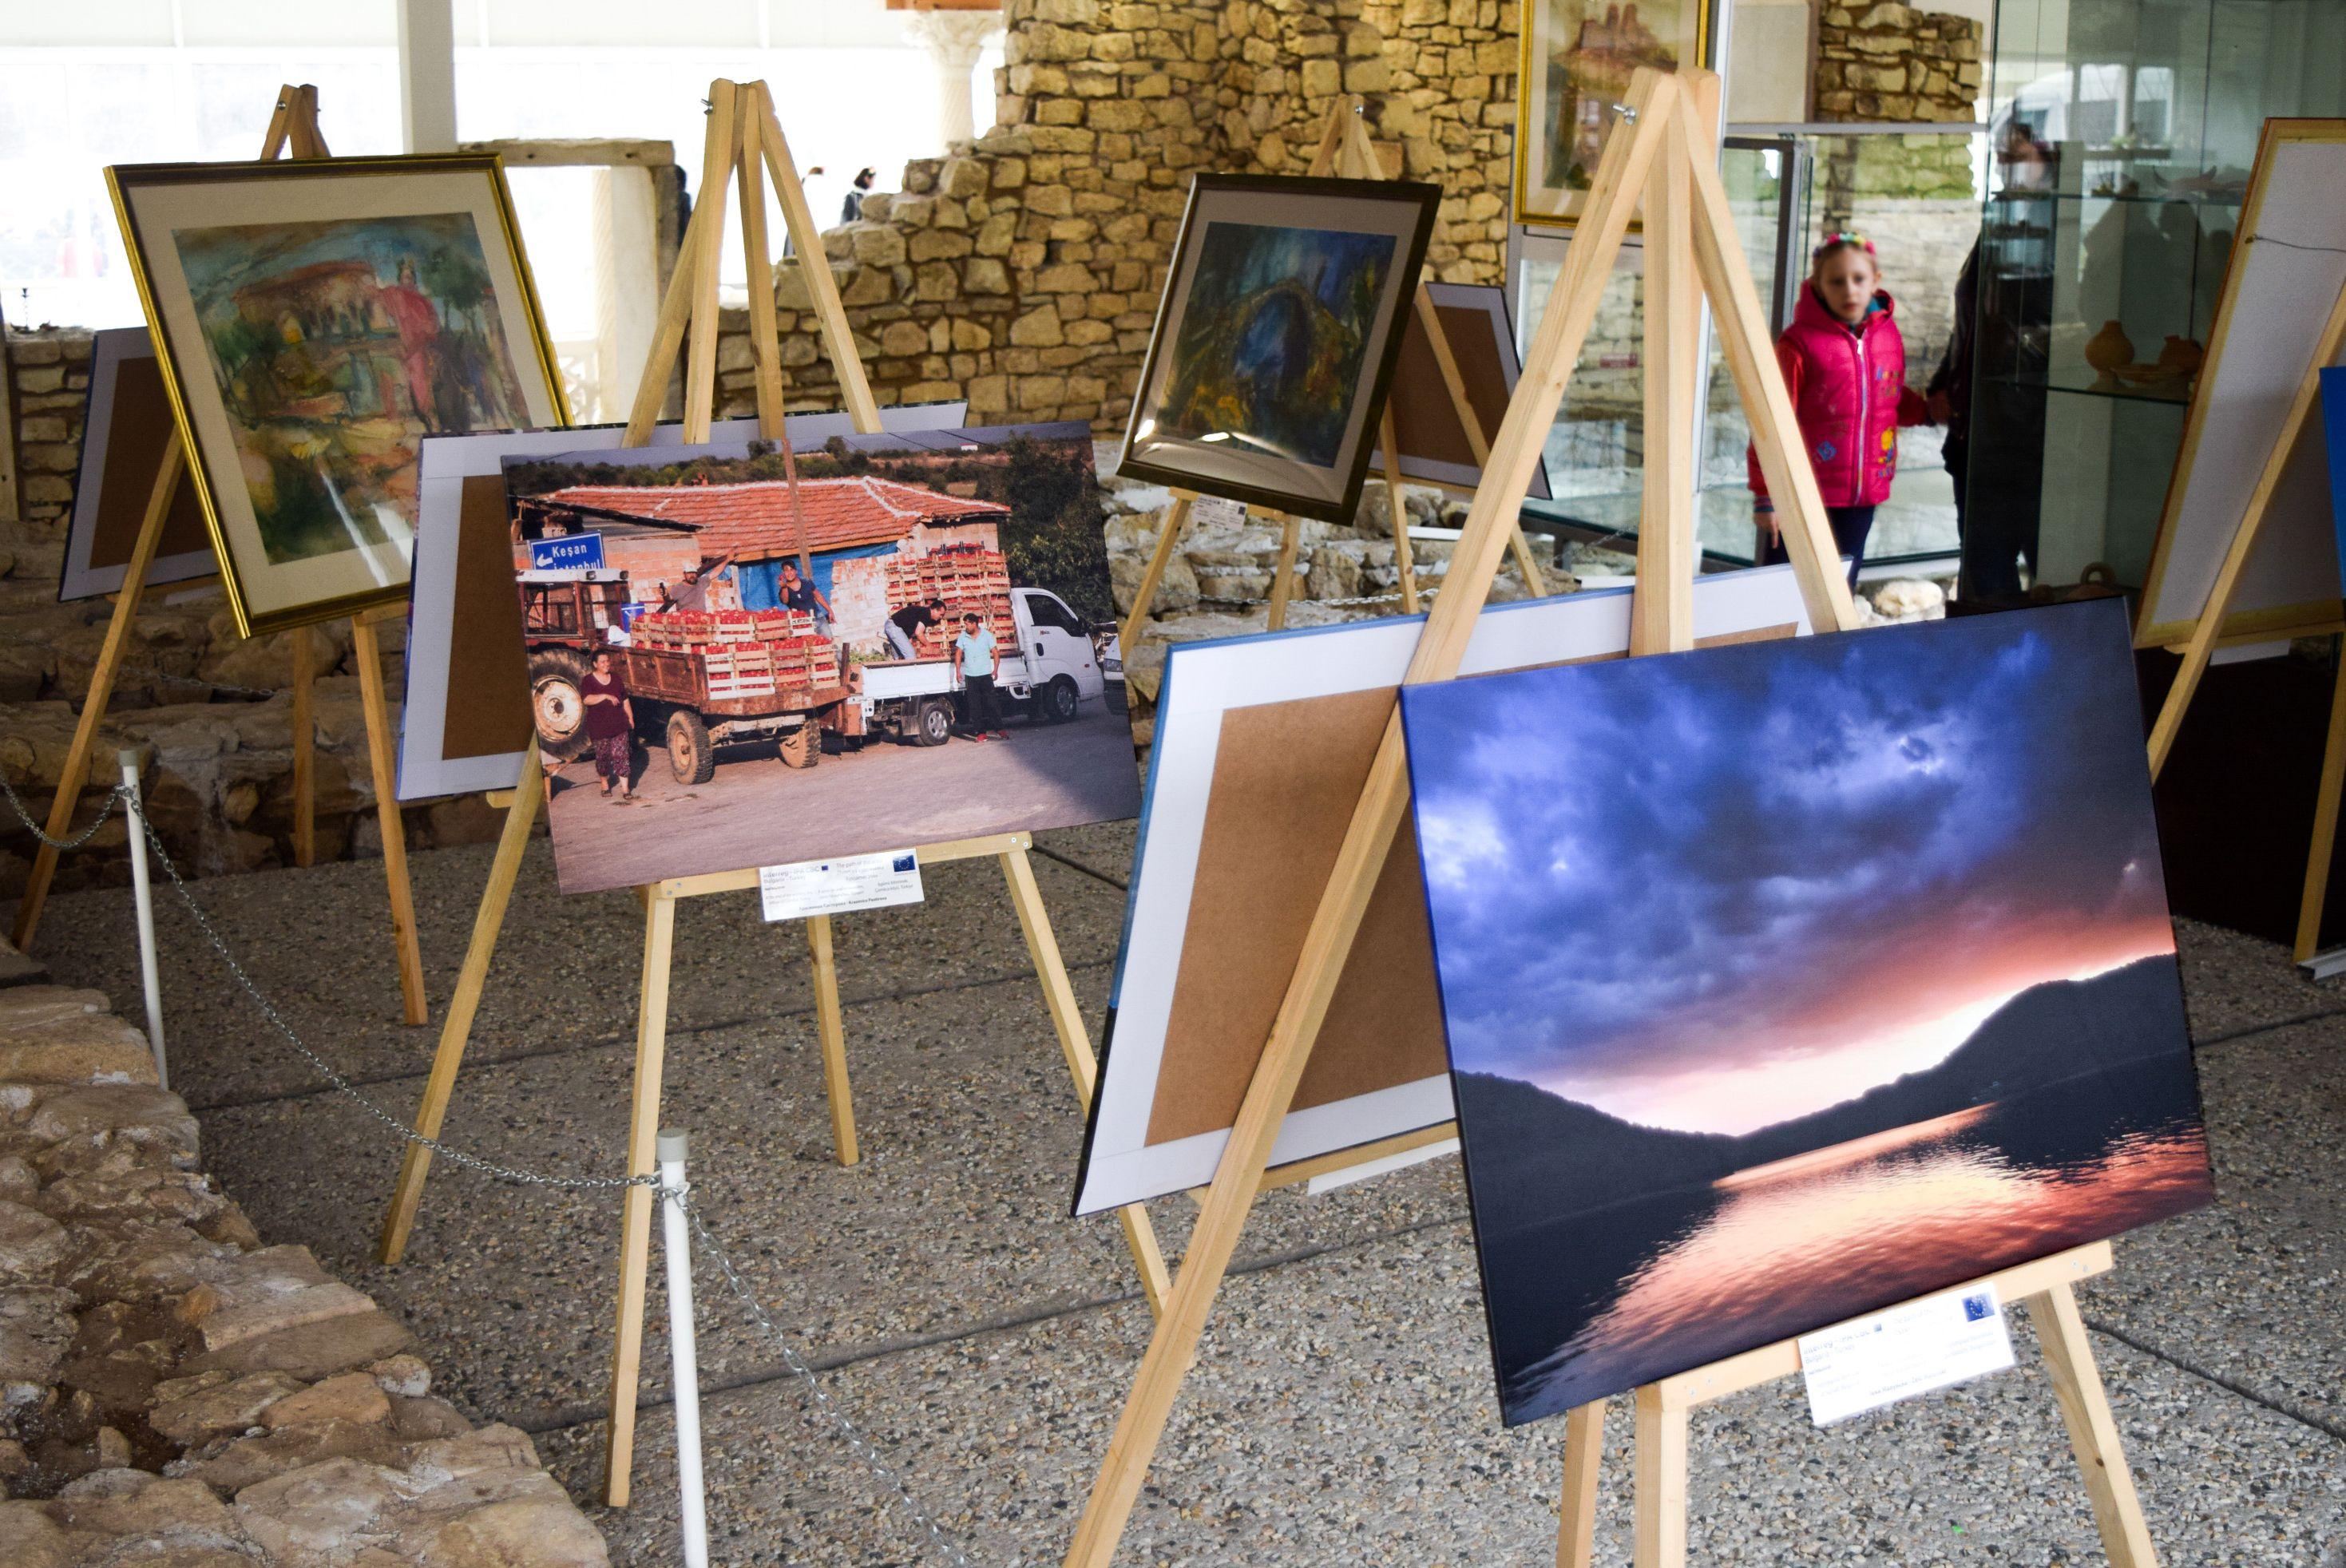 Exhibition in Ivaylovgrad, Bulgaria 17-18 March 2018 ©Tihomir Delchev